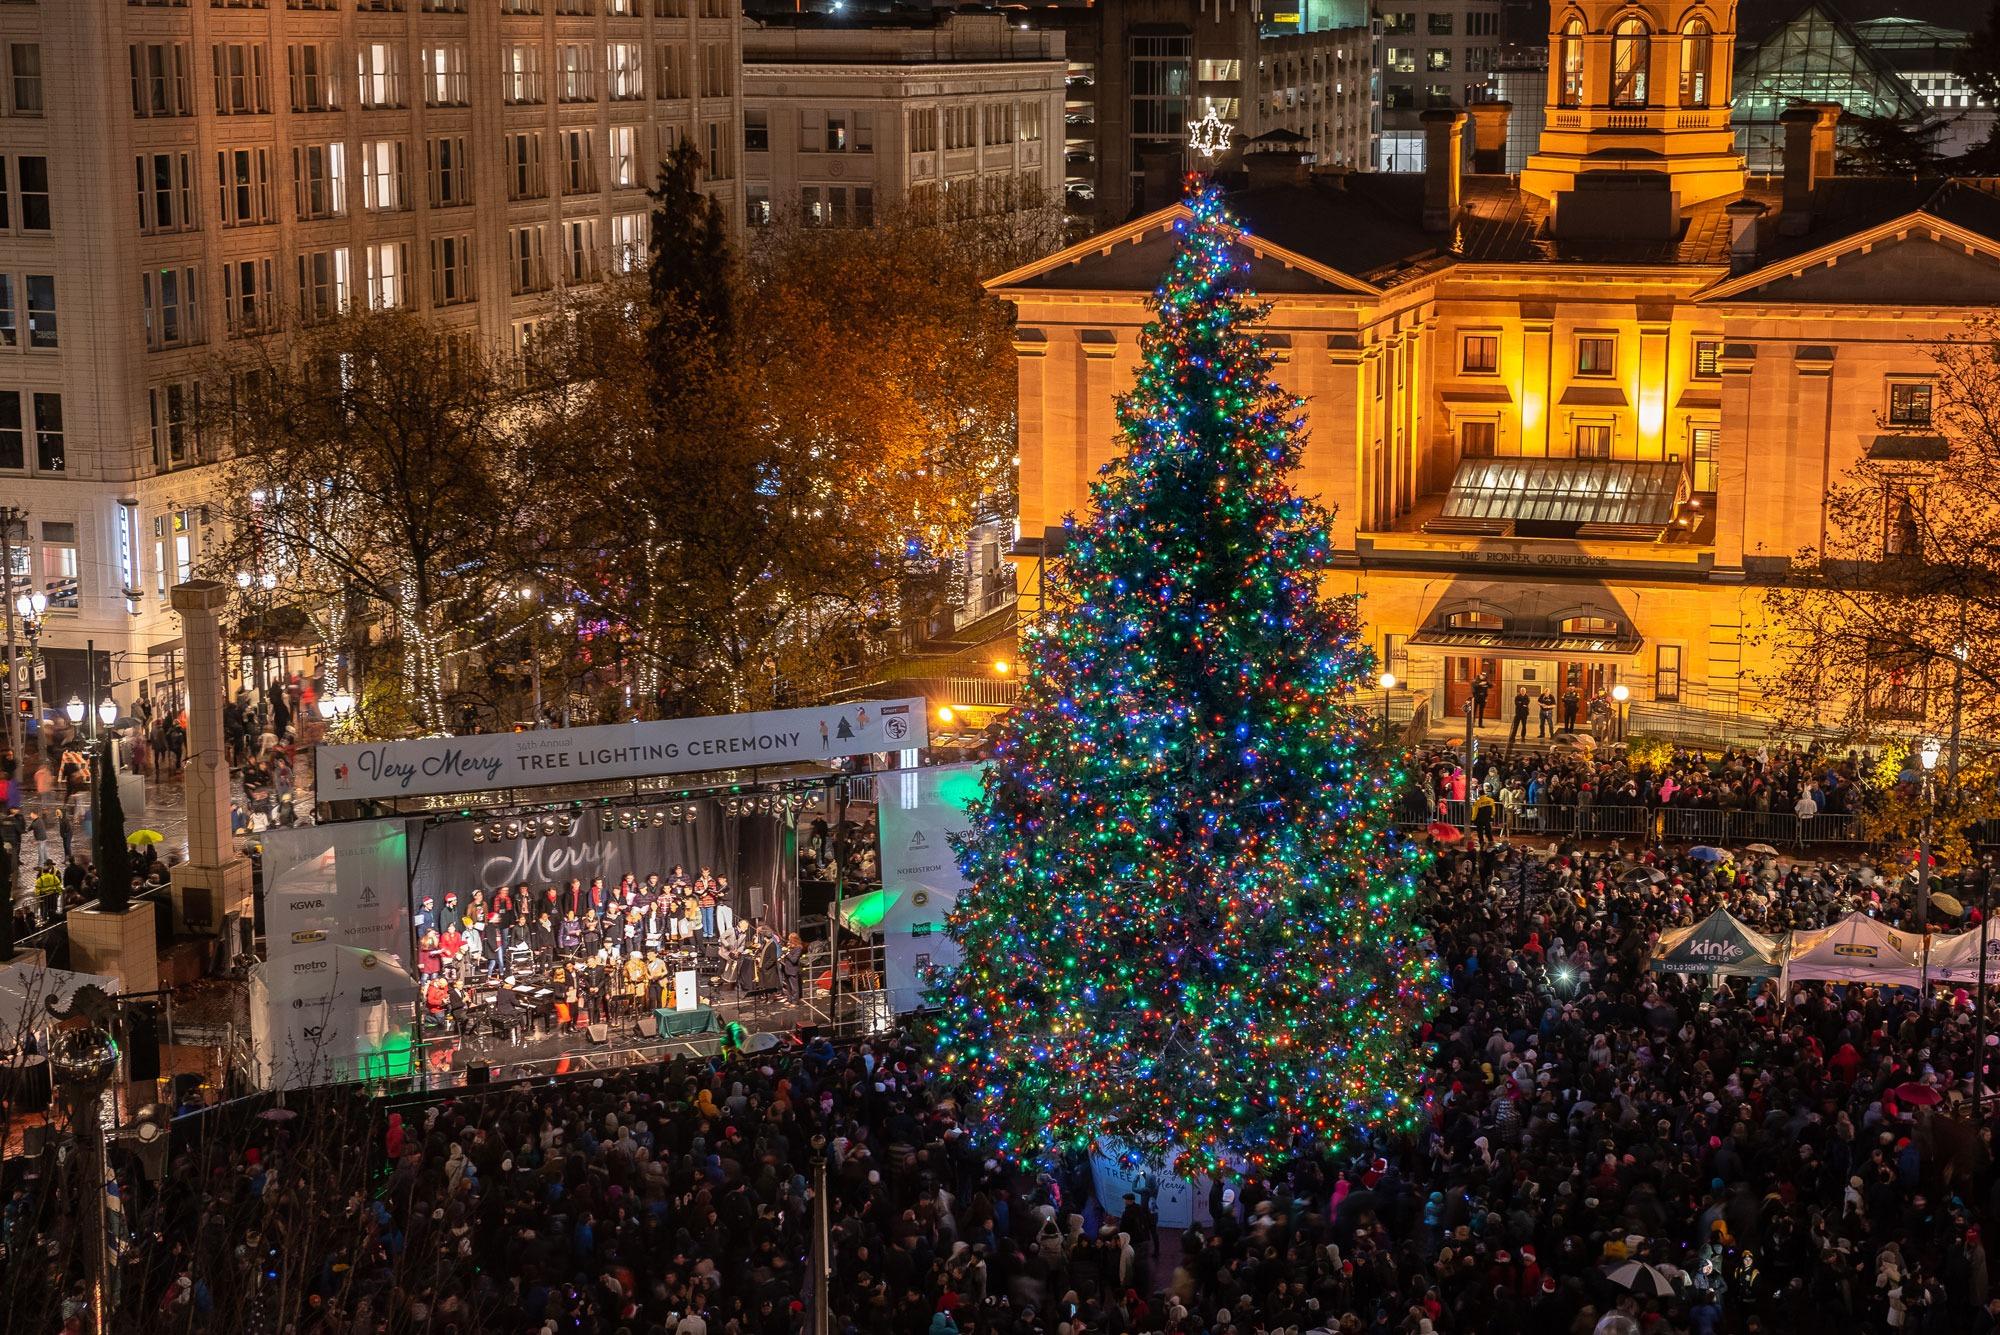 Pioneer Square Christmas Tree Lighting 2020 35th Annual Tree Lighting Ceremony presented by SmartPark